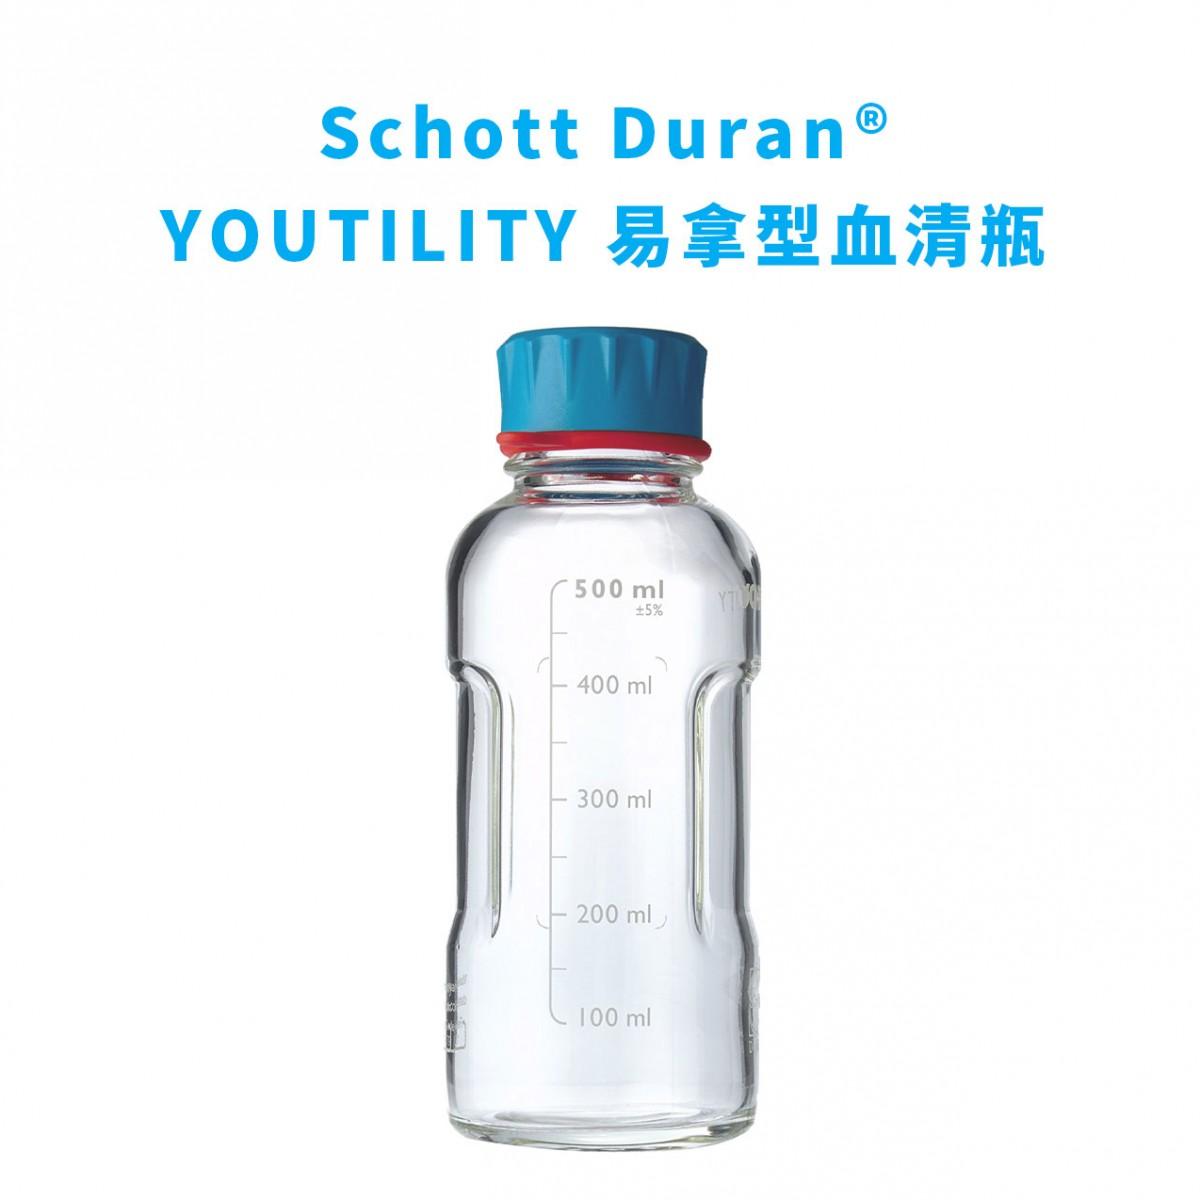 { 血清瓶|Schott Duran® YOUTILITY 易拿型 GL45 }